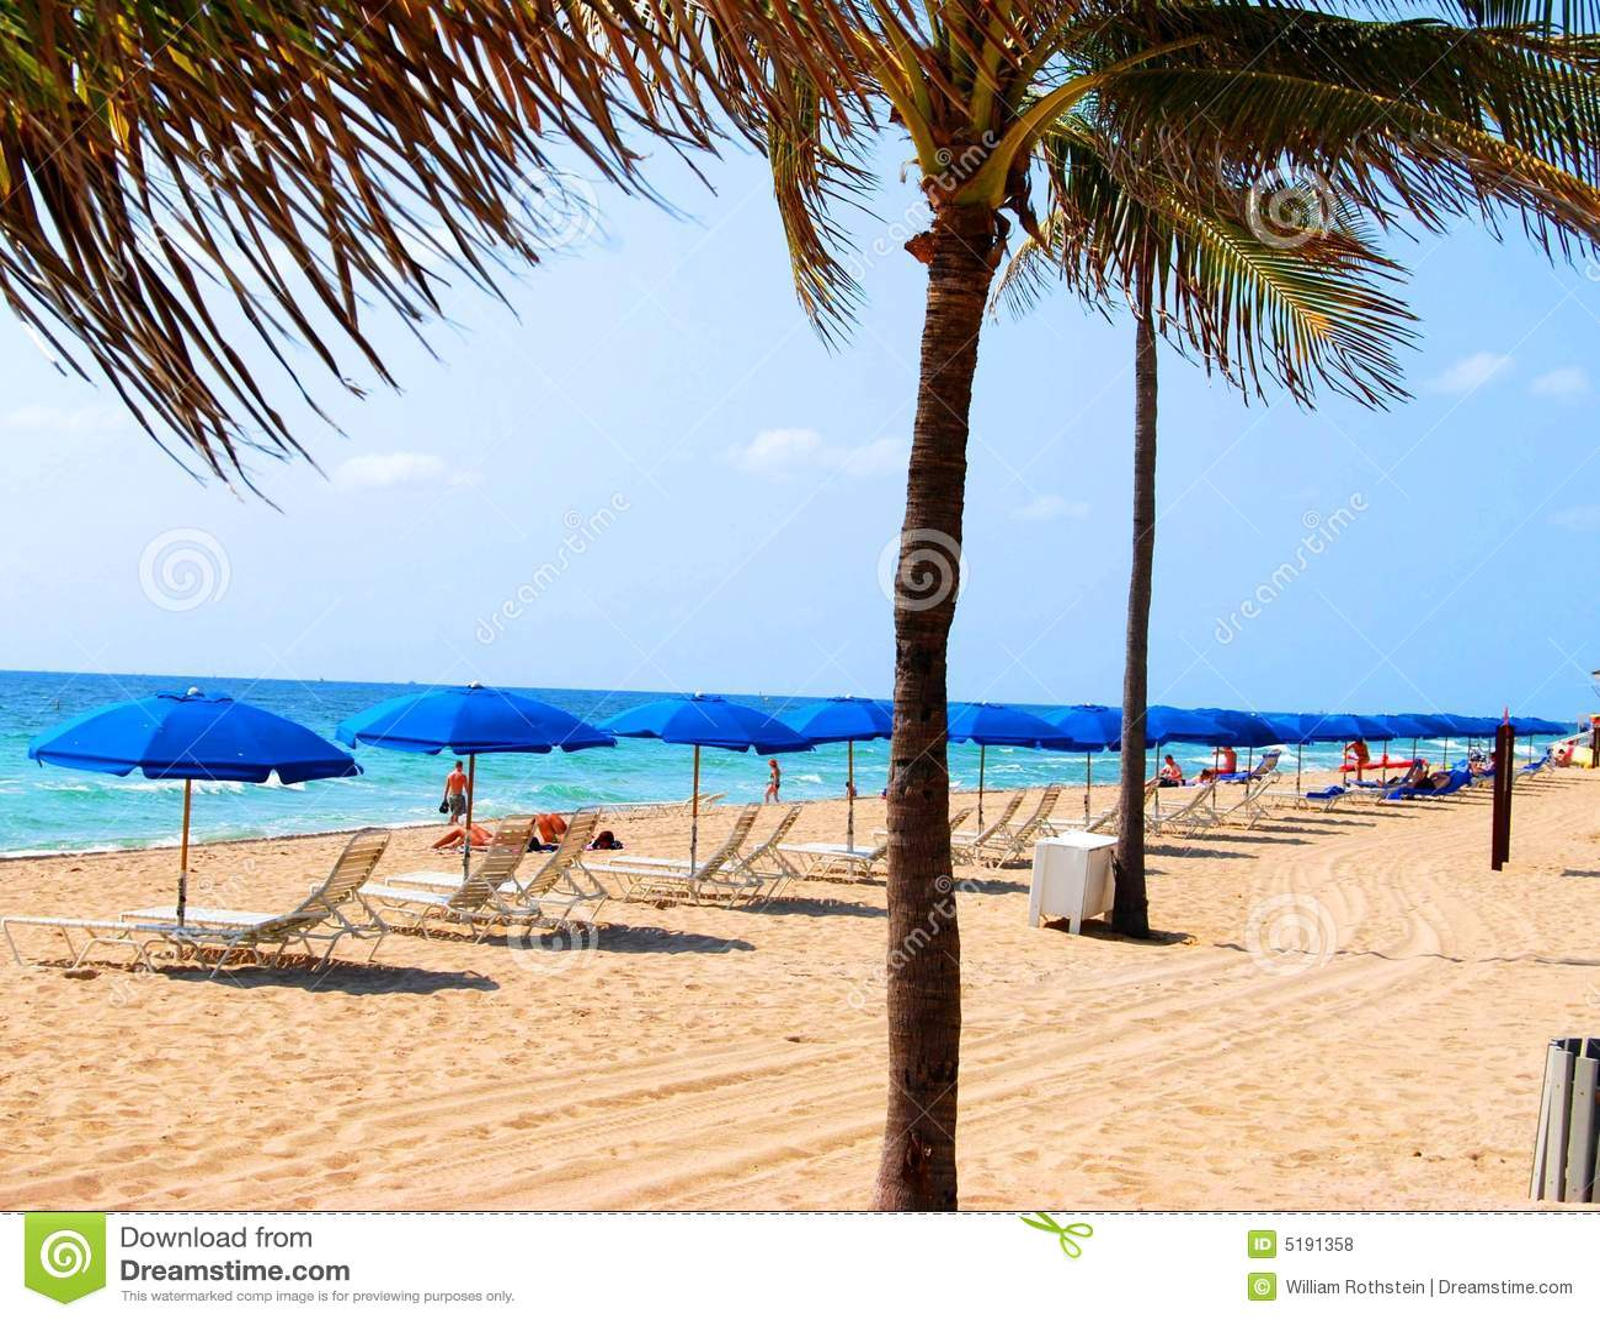 Island Beach Scenes: Caribbean Beach Scene Royalty Free Stock Photos